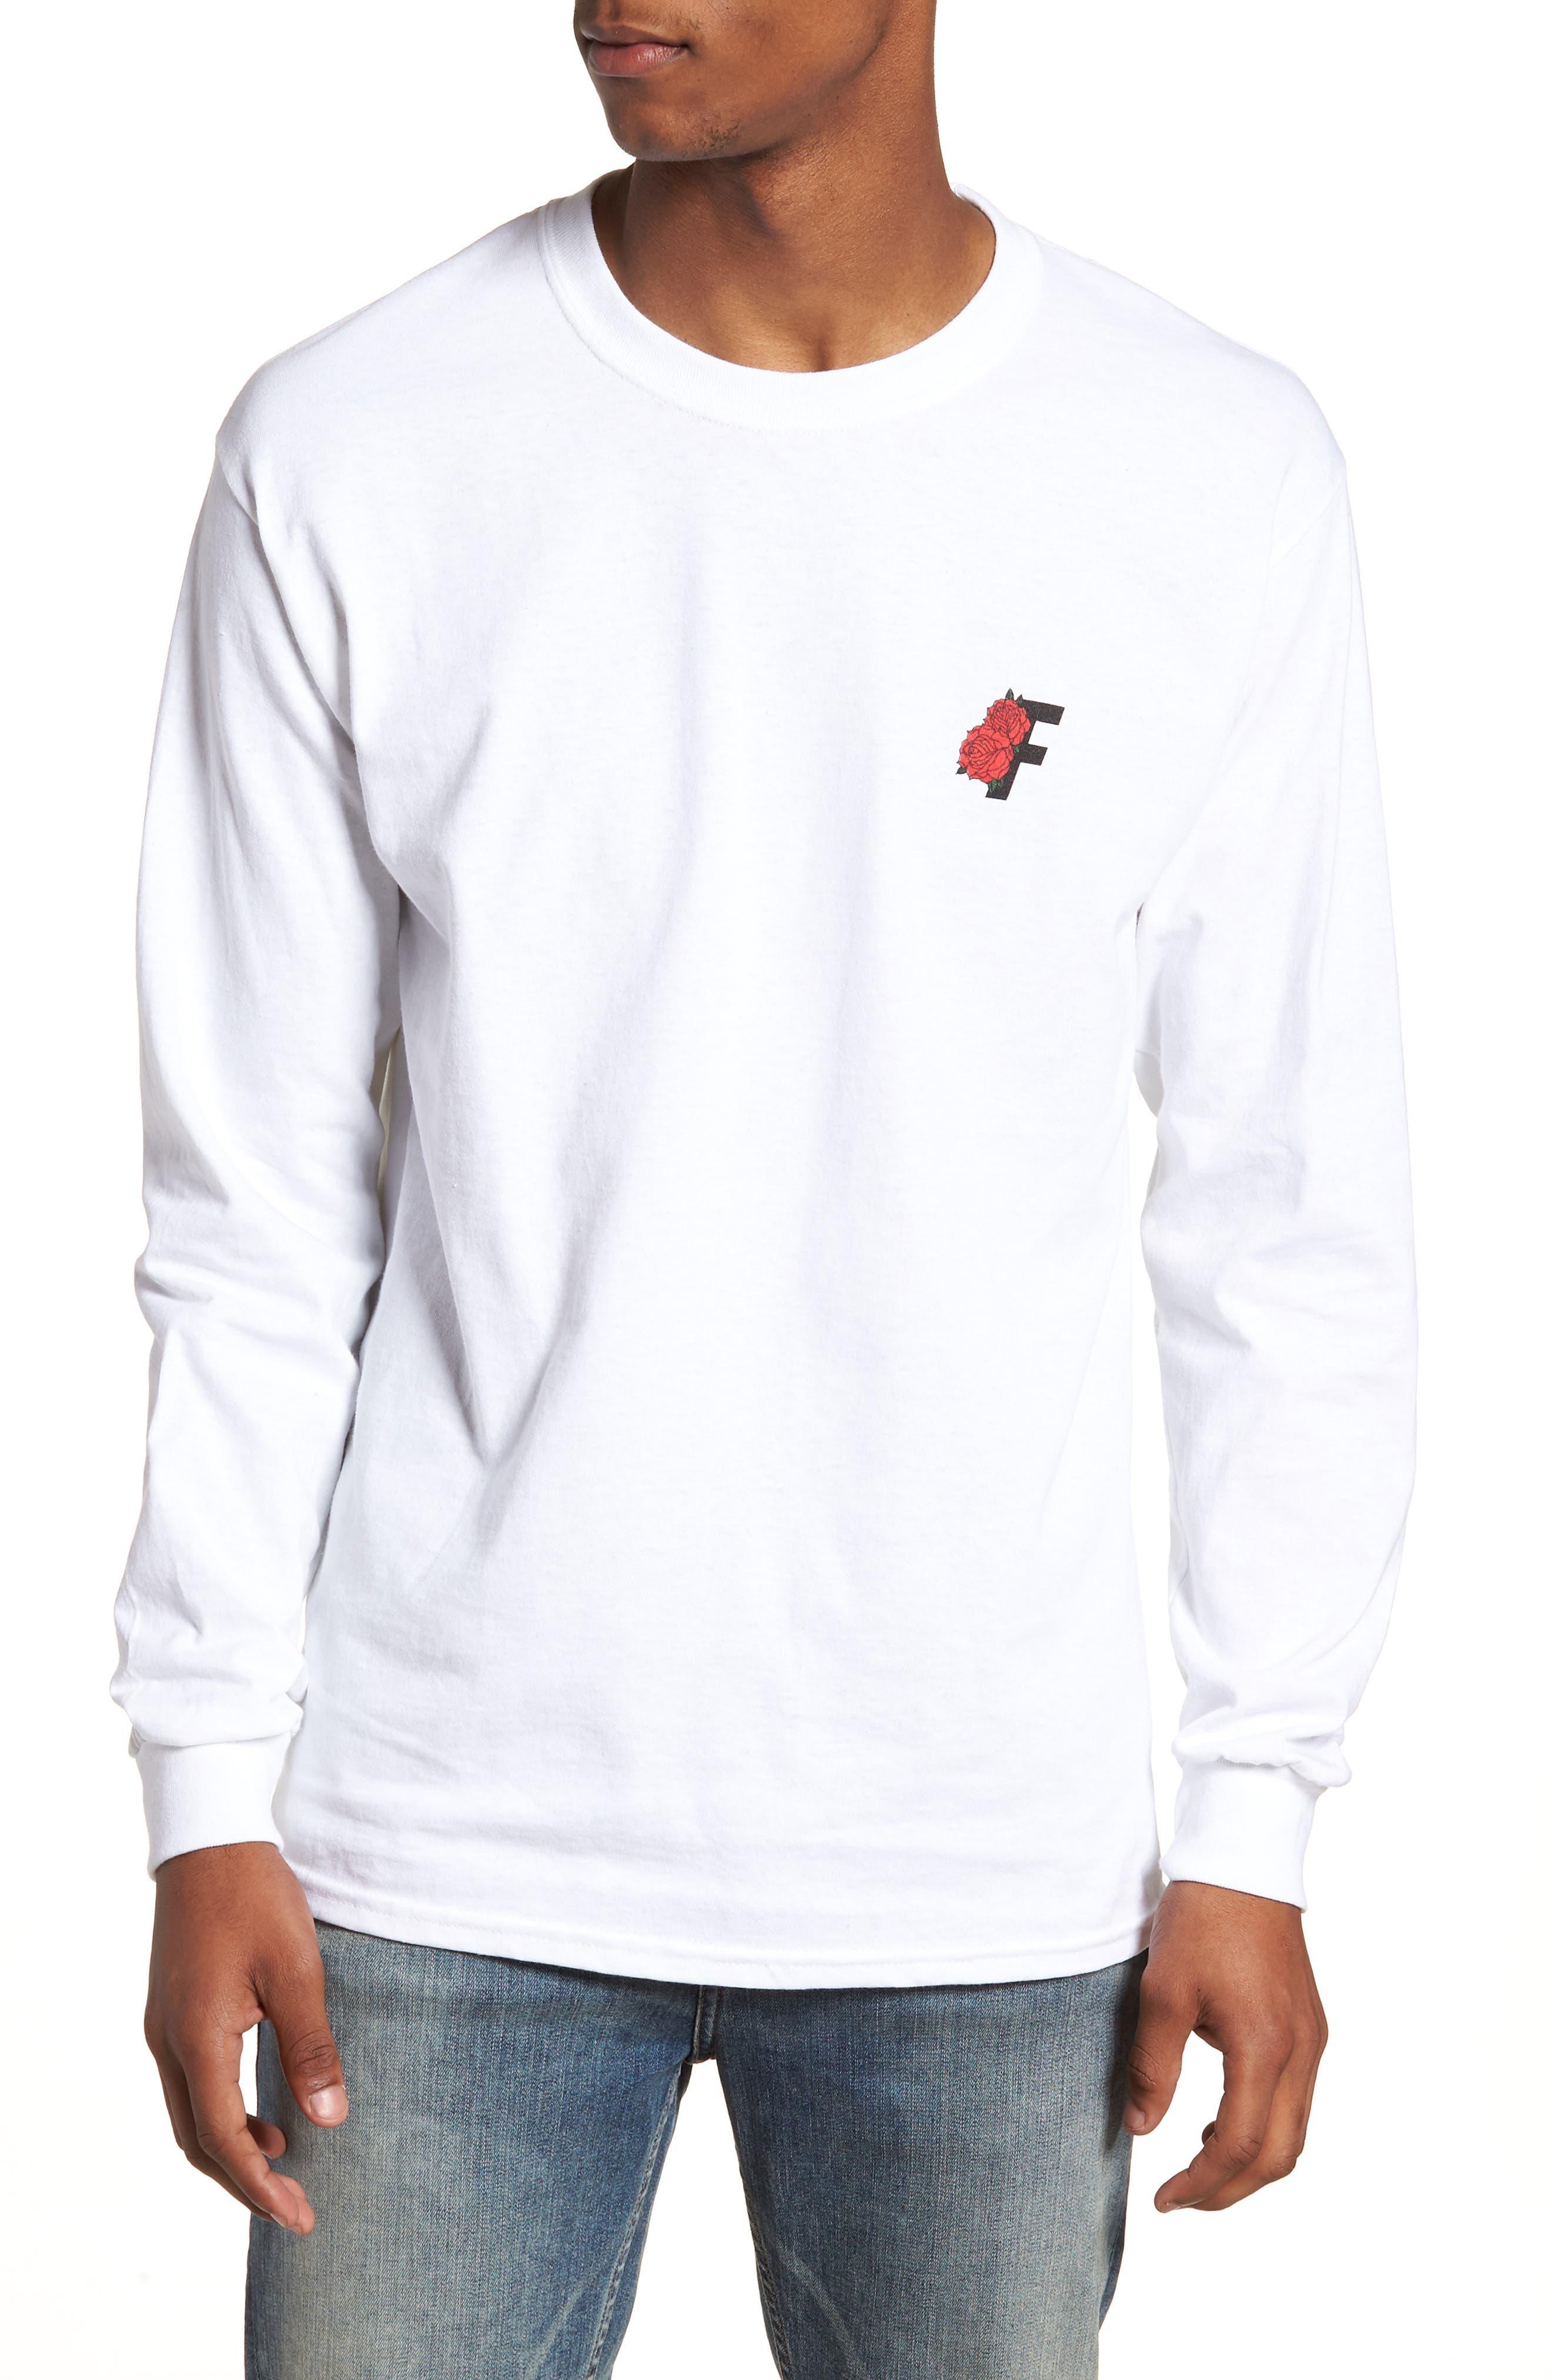 Roses Graphic T-Shirt,                             Main thumbnail 1, color,                             White